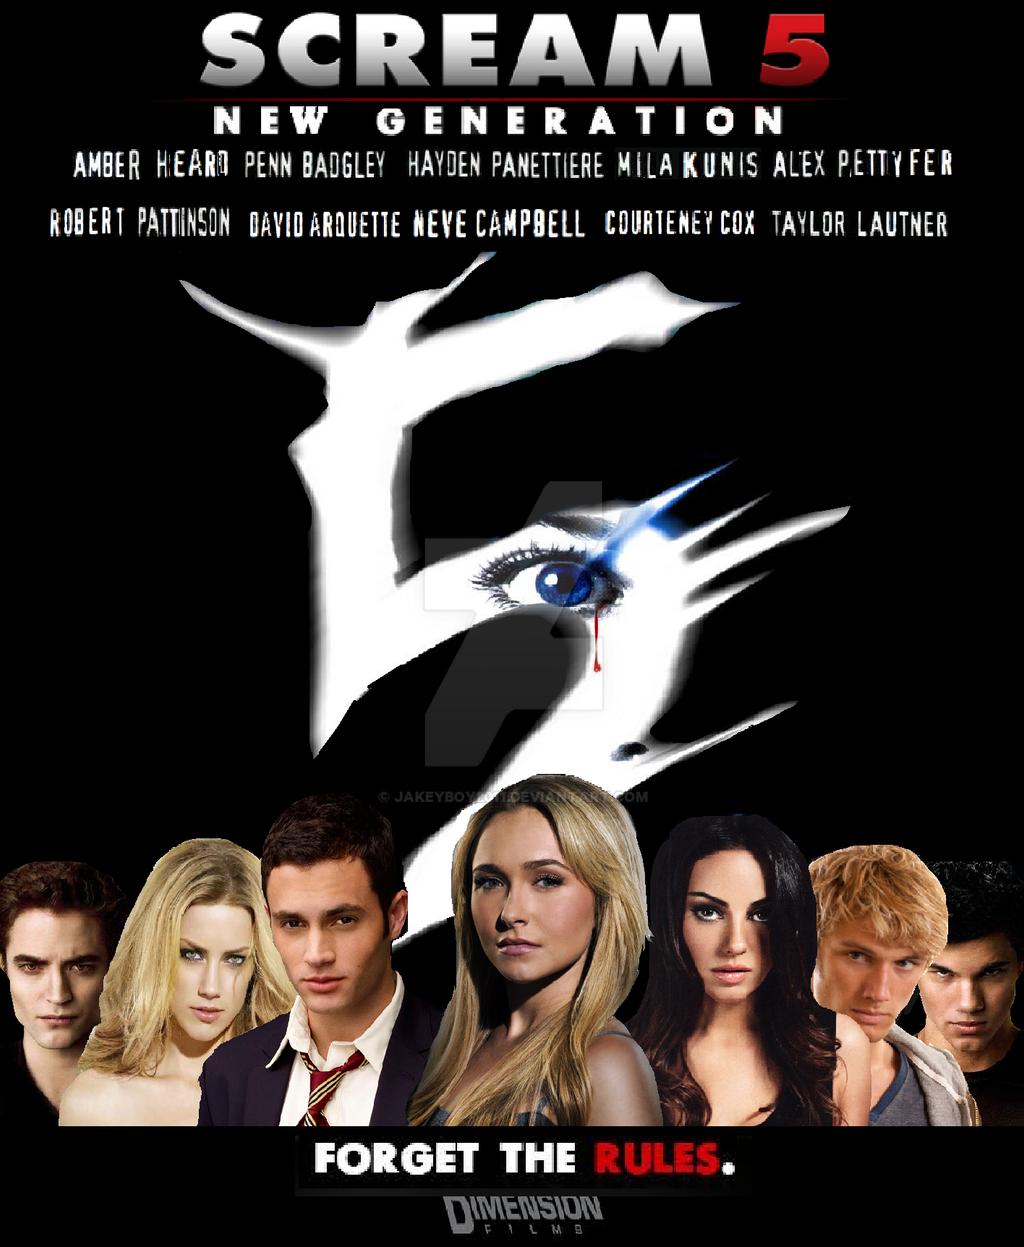 Scream 5 New Generation Poster by jakeyboy2011 on DeviantArt